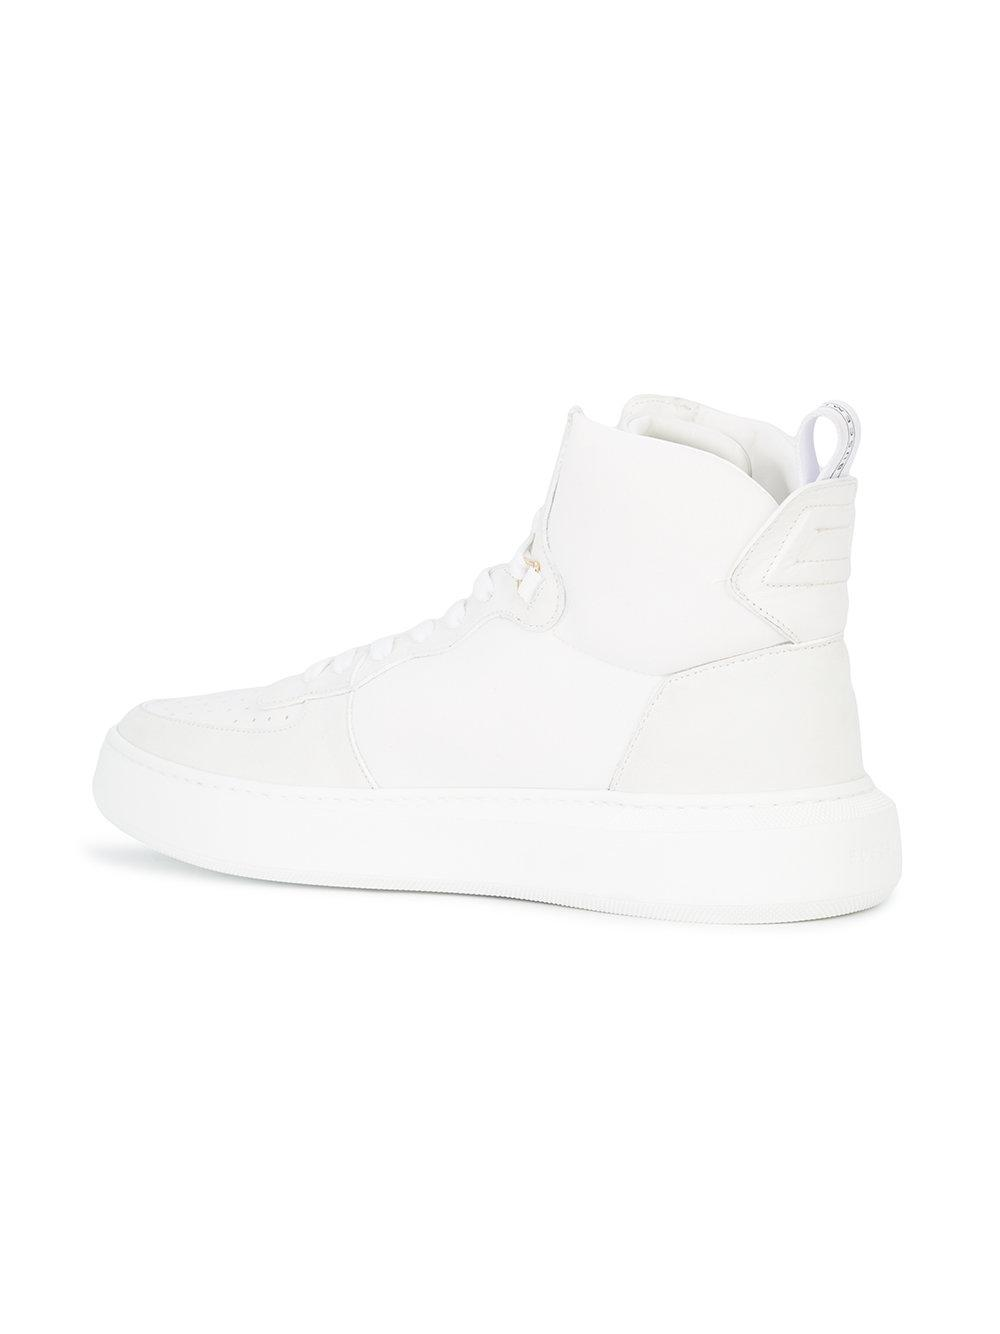 Uno Basket sneakers - White Buscemi f7MU5aY8bh